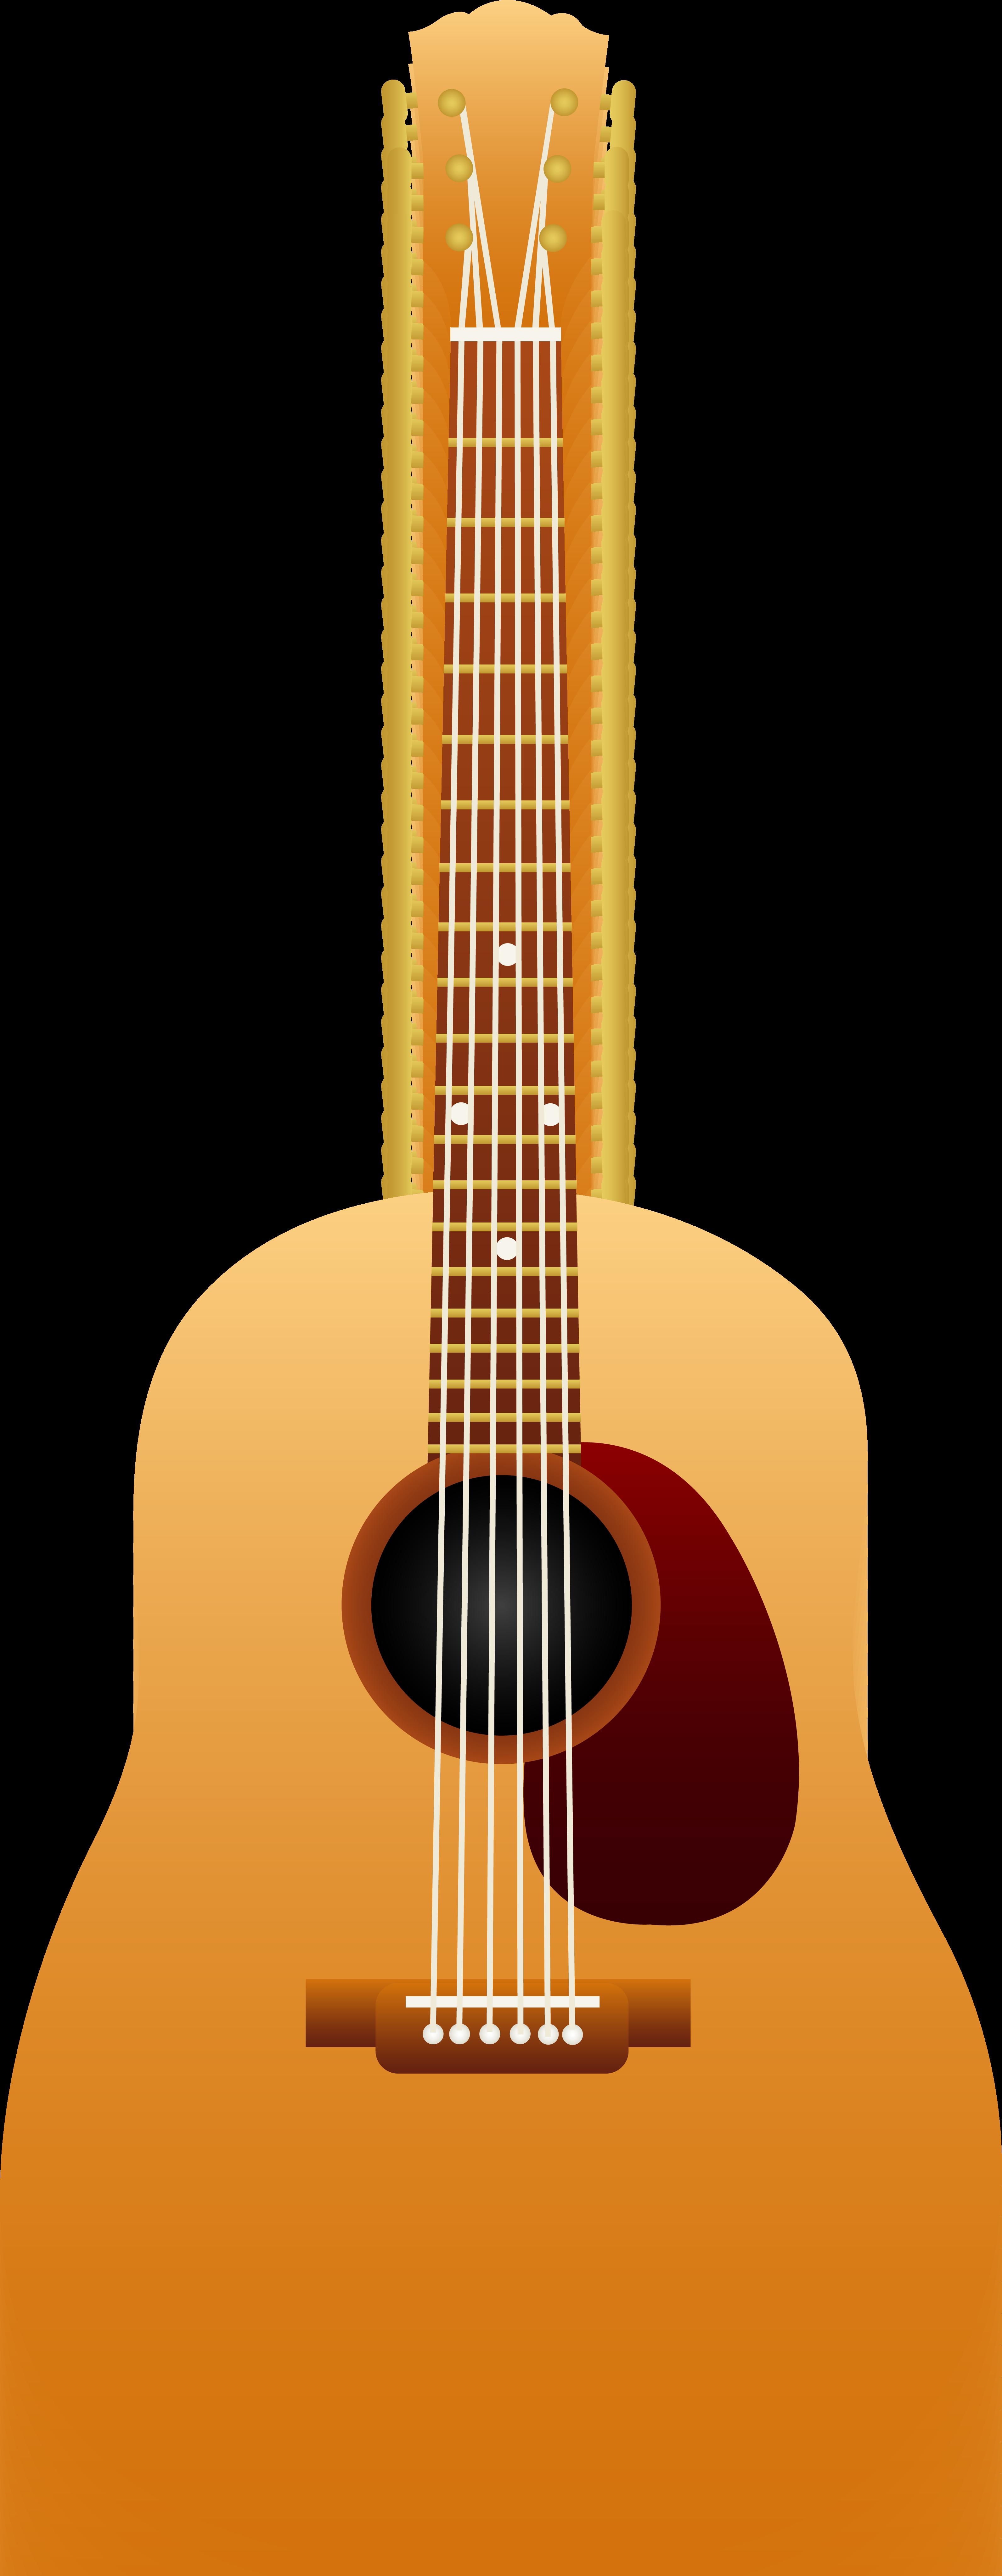 Beats clipart guitar string Pinterest Guitar  Clip Chloe